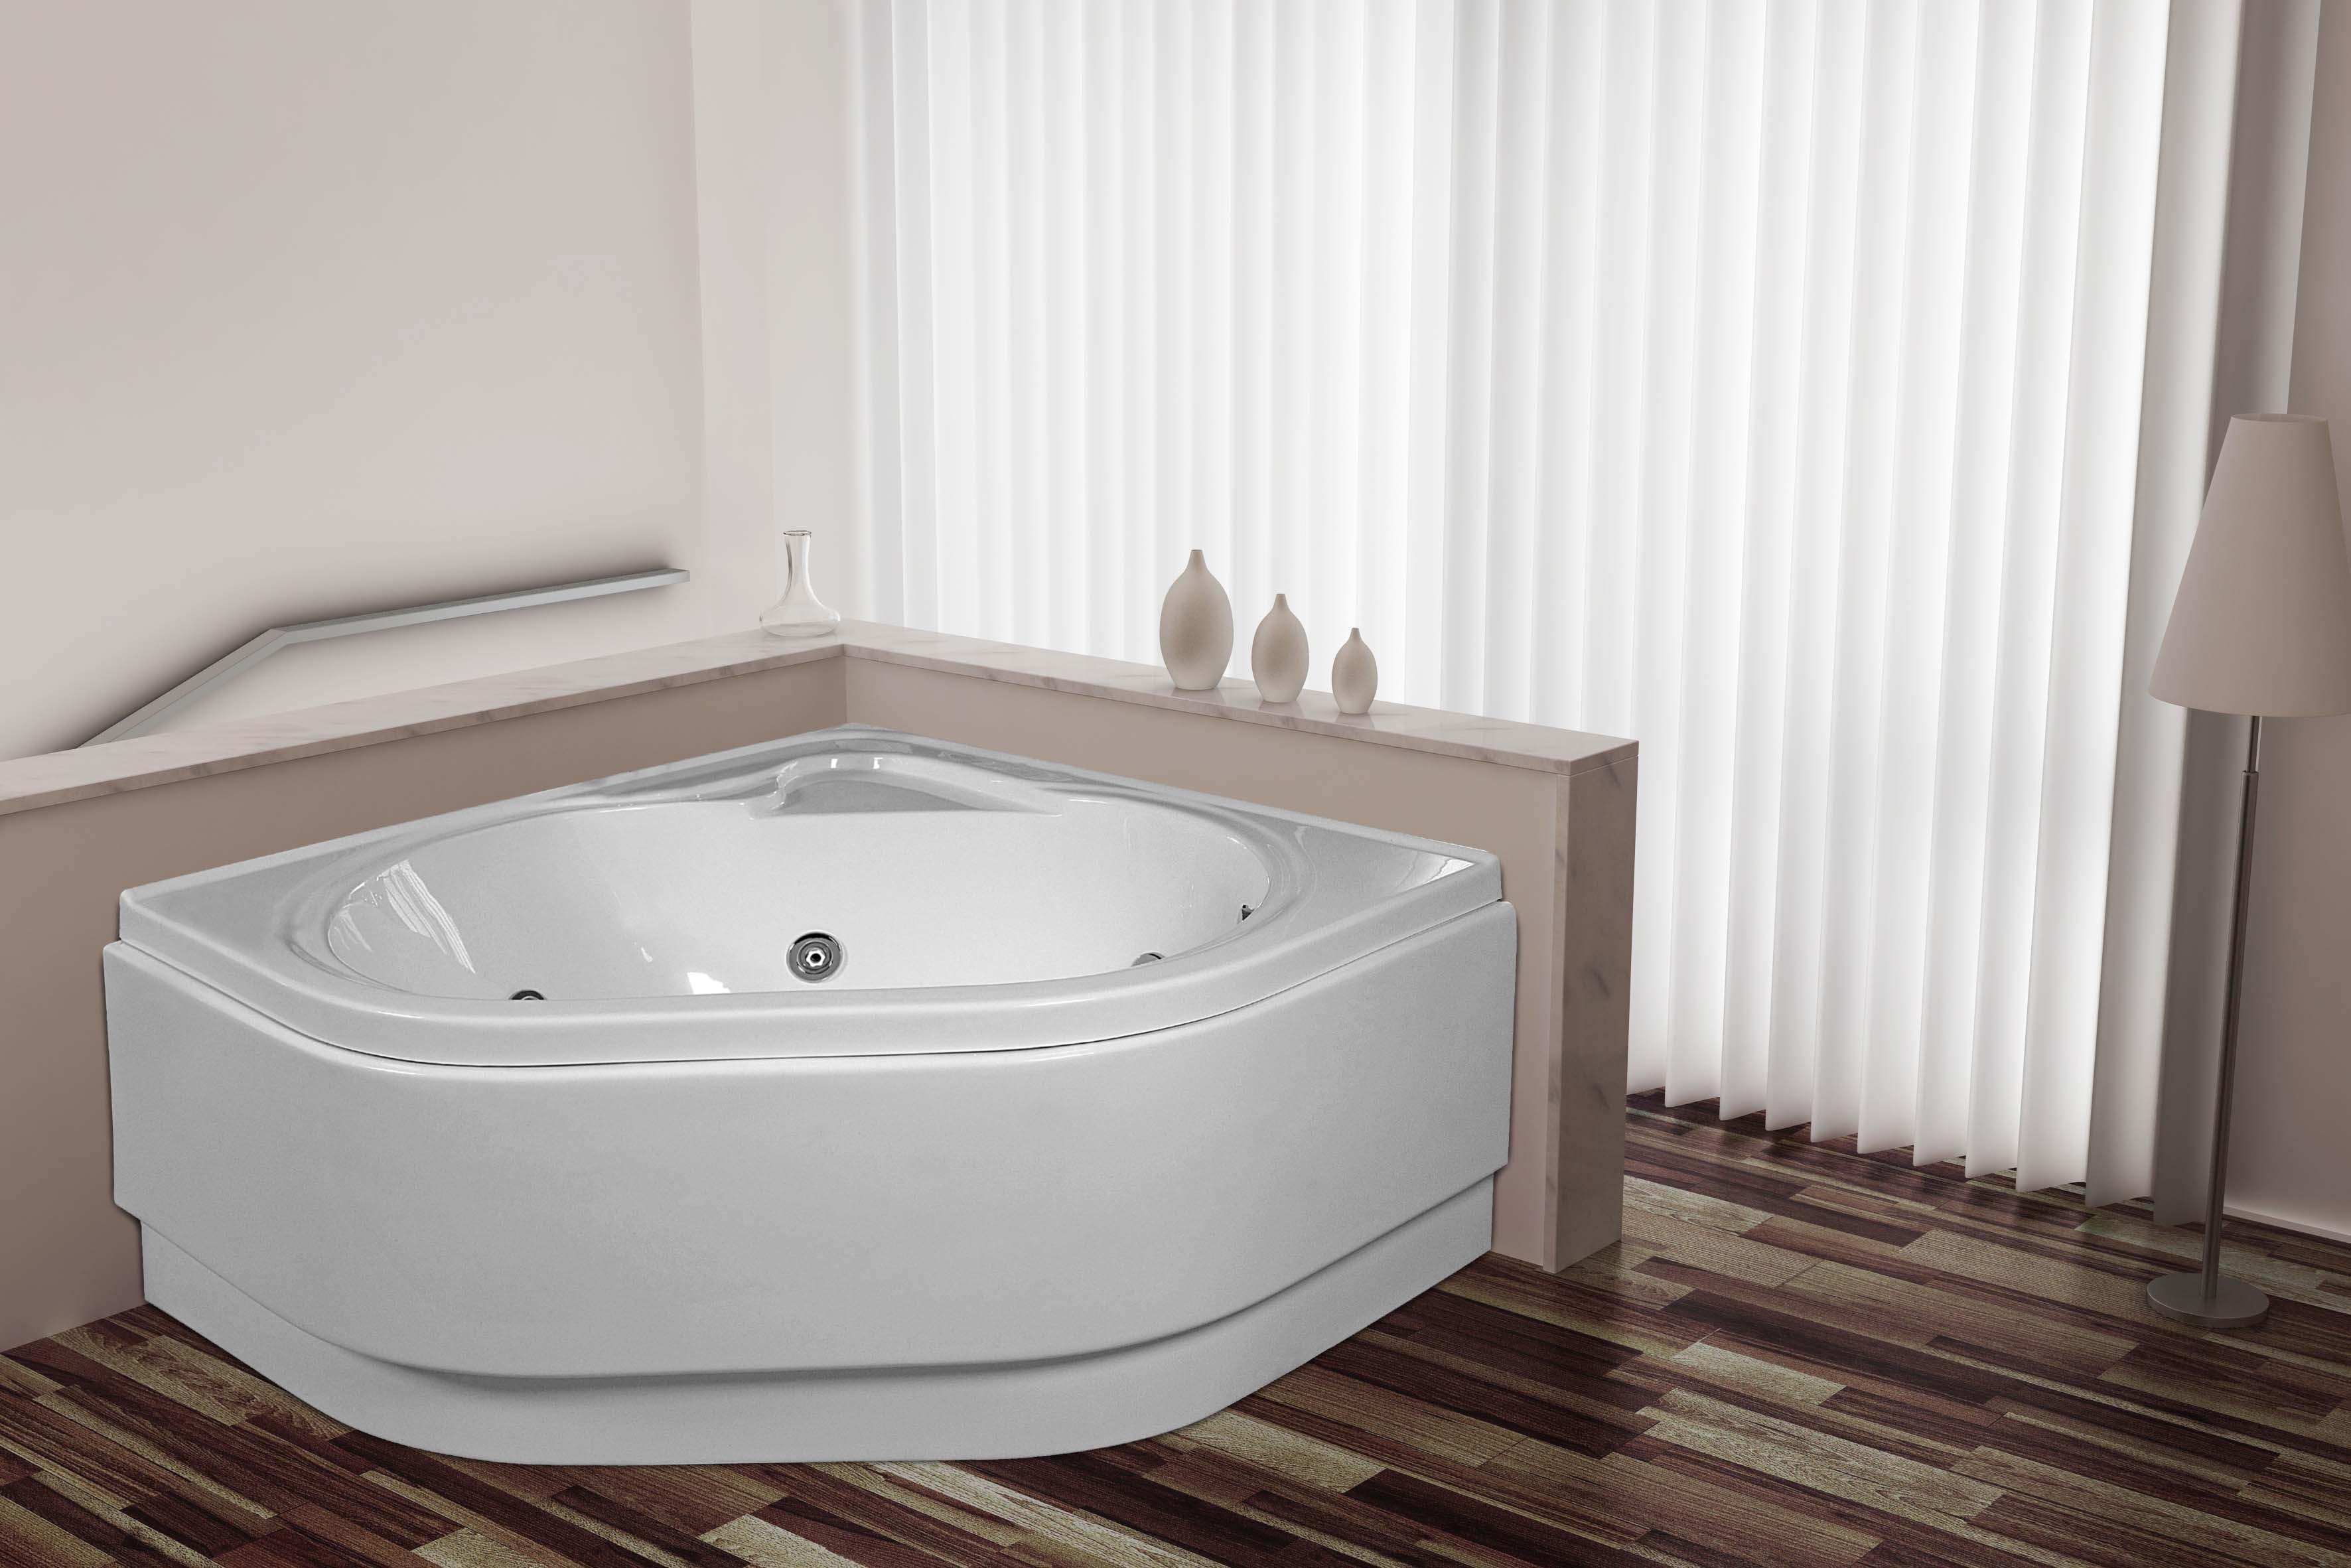 Vasche da bagno jetfun vasca da bagno economica corporatebs